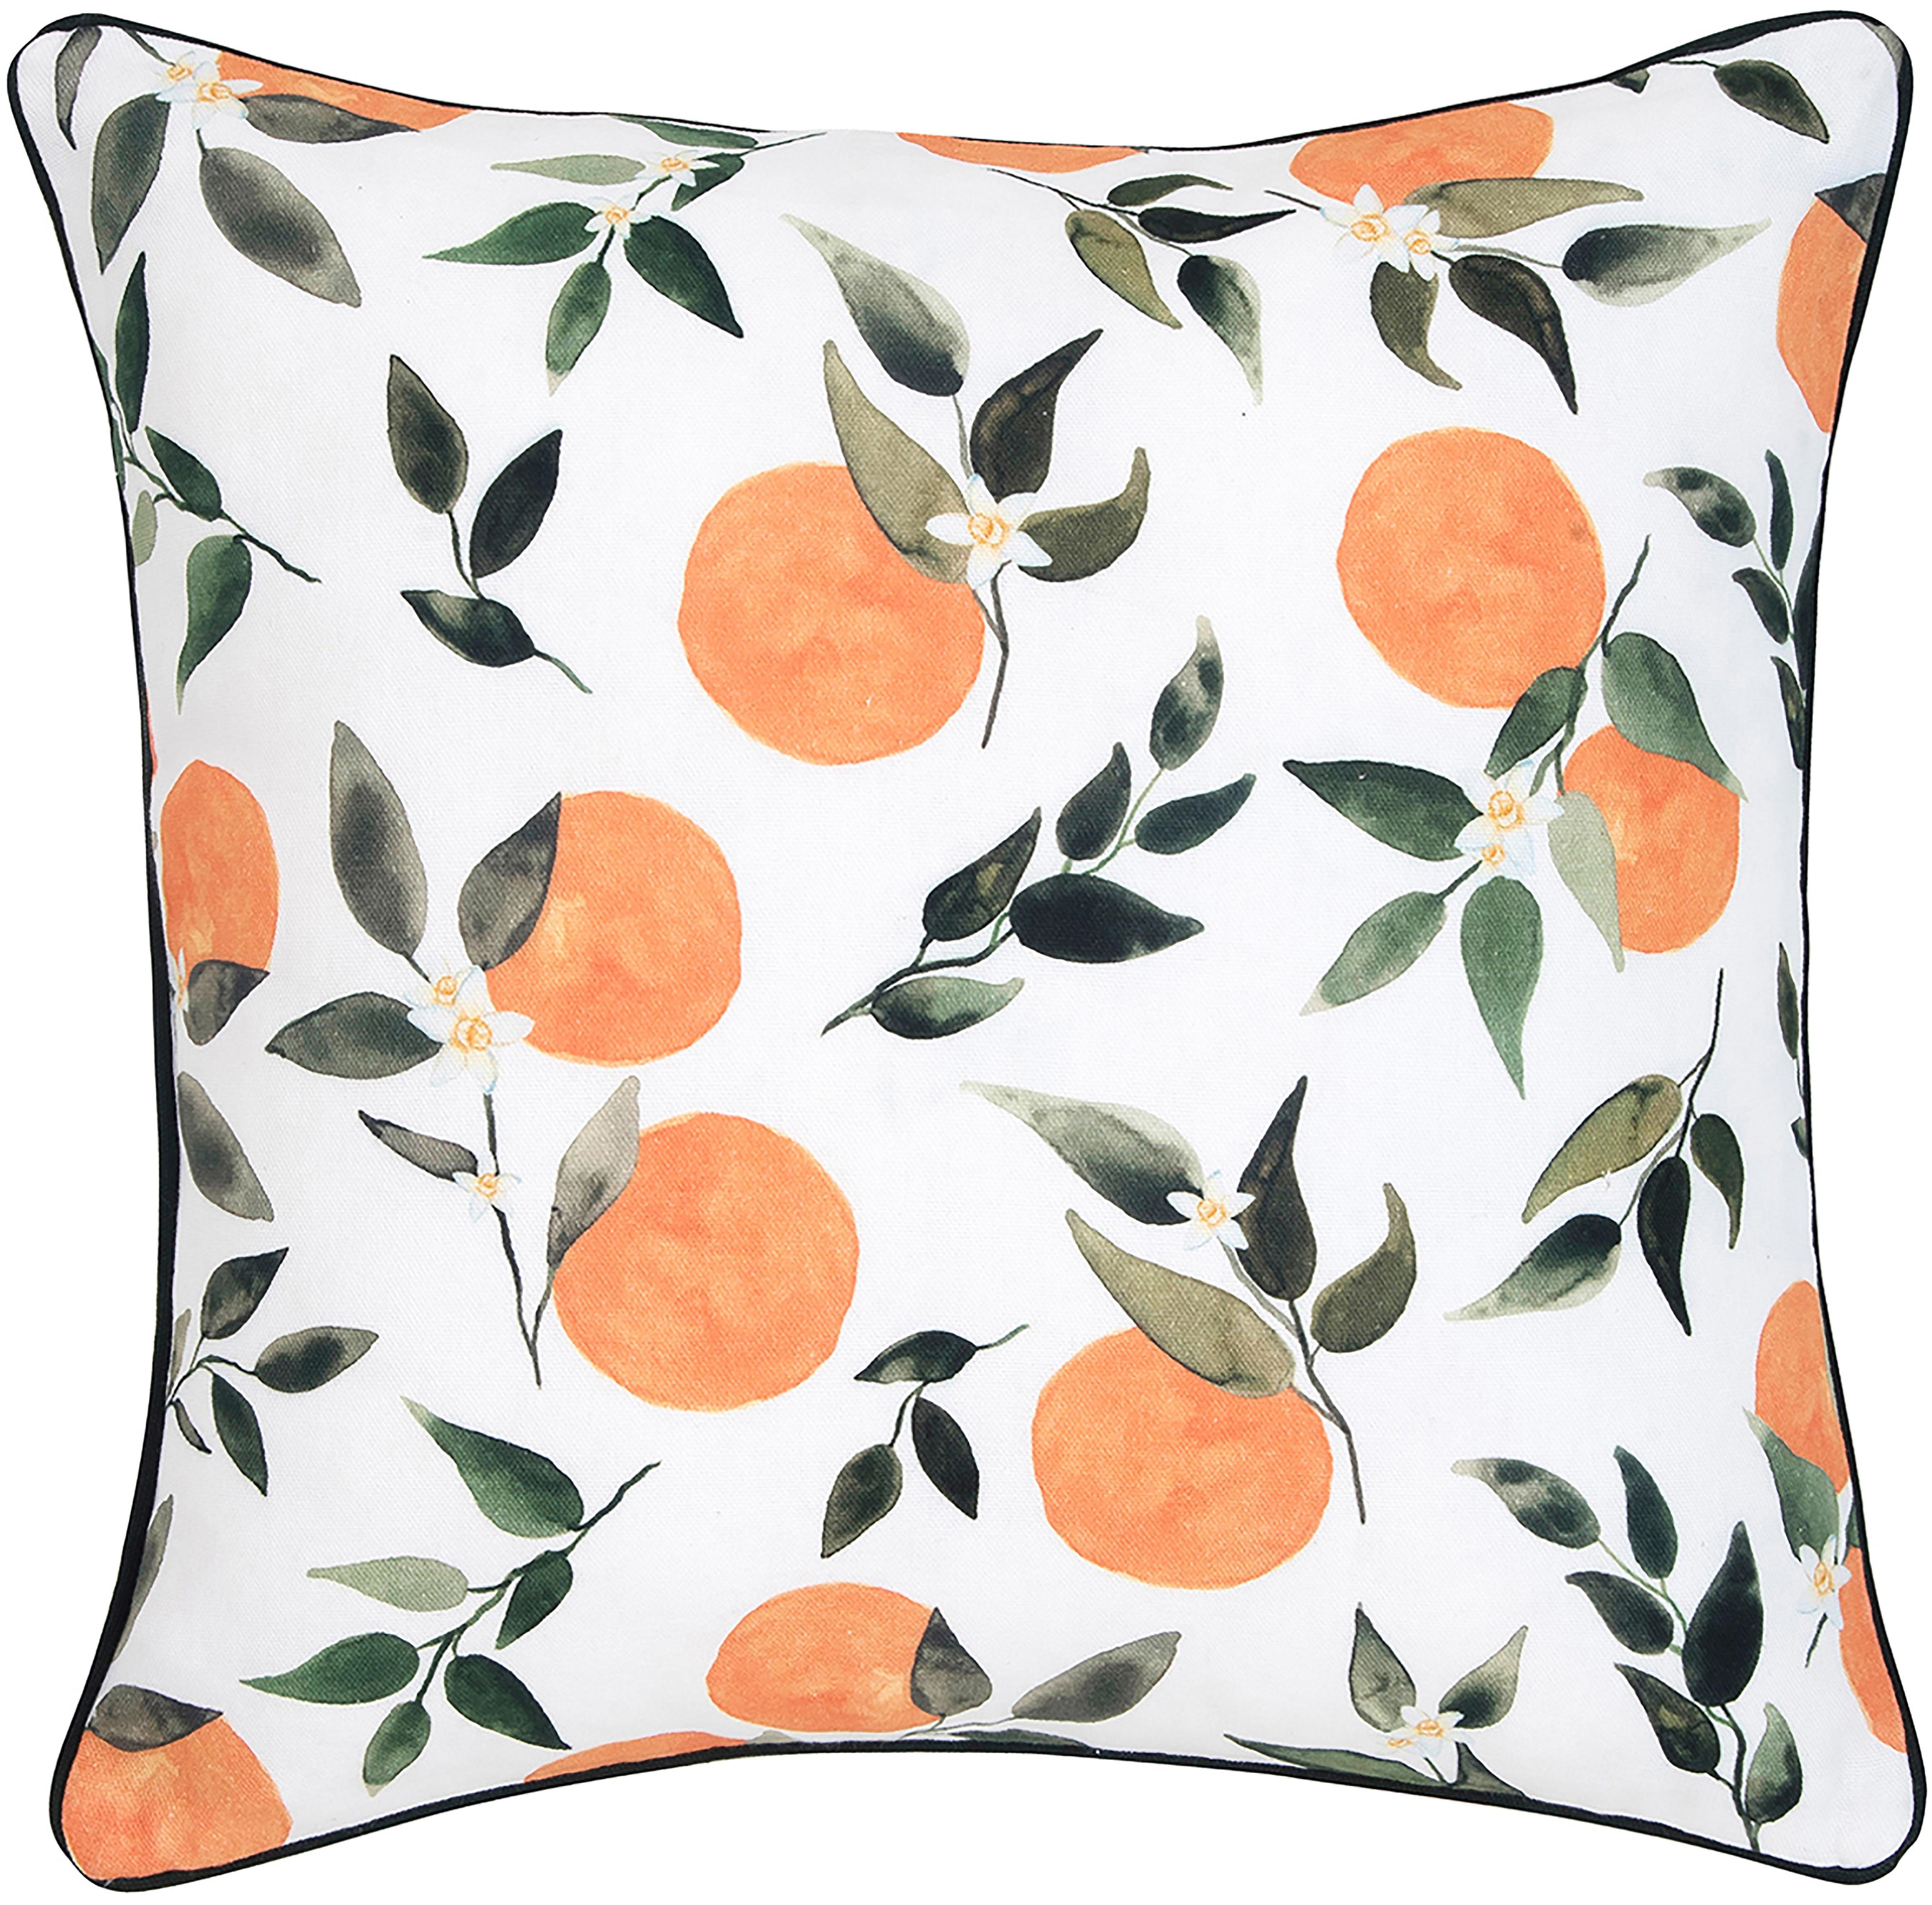 Federa arredo Larangina, Cotone, Bianco, verde, arancione Bordino: grigio scuro, Larg. 40 x Lung. 40 cm